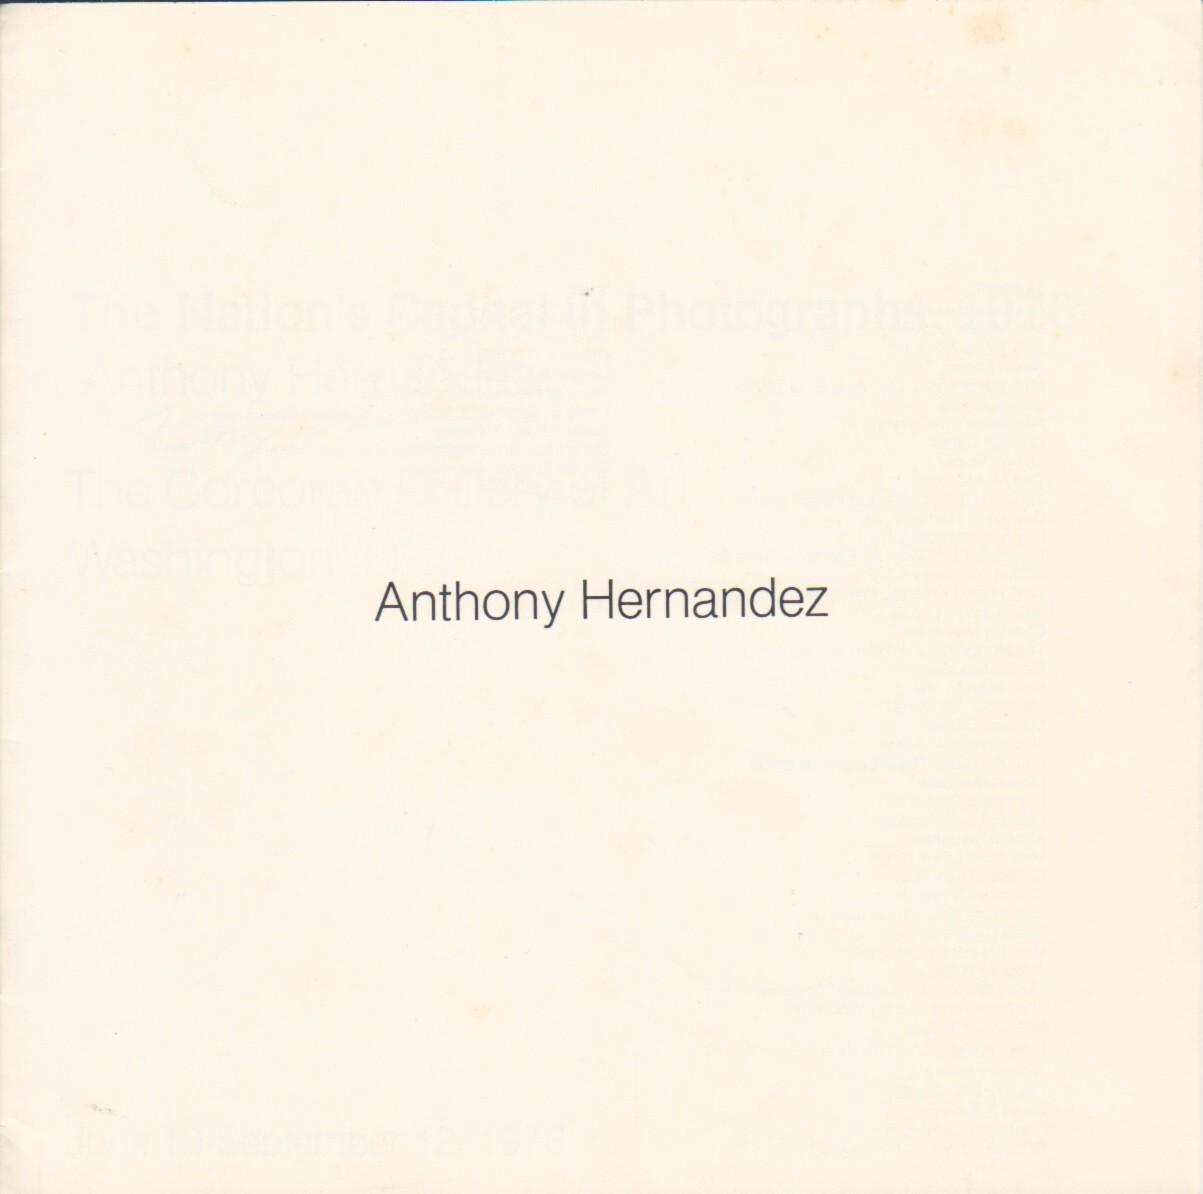 (HERNANDEZ, ANTHONY). HERNANDEZ, ANTHONY, JANE LIVINGSTON & ROY SLADE - ANTHONY HERNANDEZ: THE NATION'S CAPITAL IN PHOTOGRAPHS, 1976 - SIGNED BY THE PHOTOGRAPHER